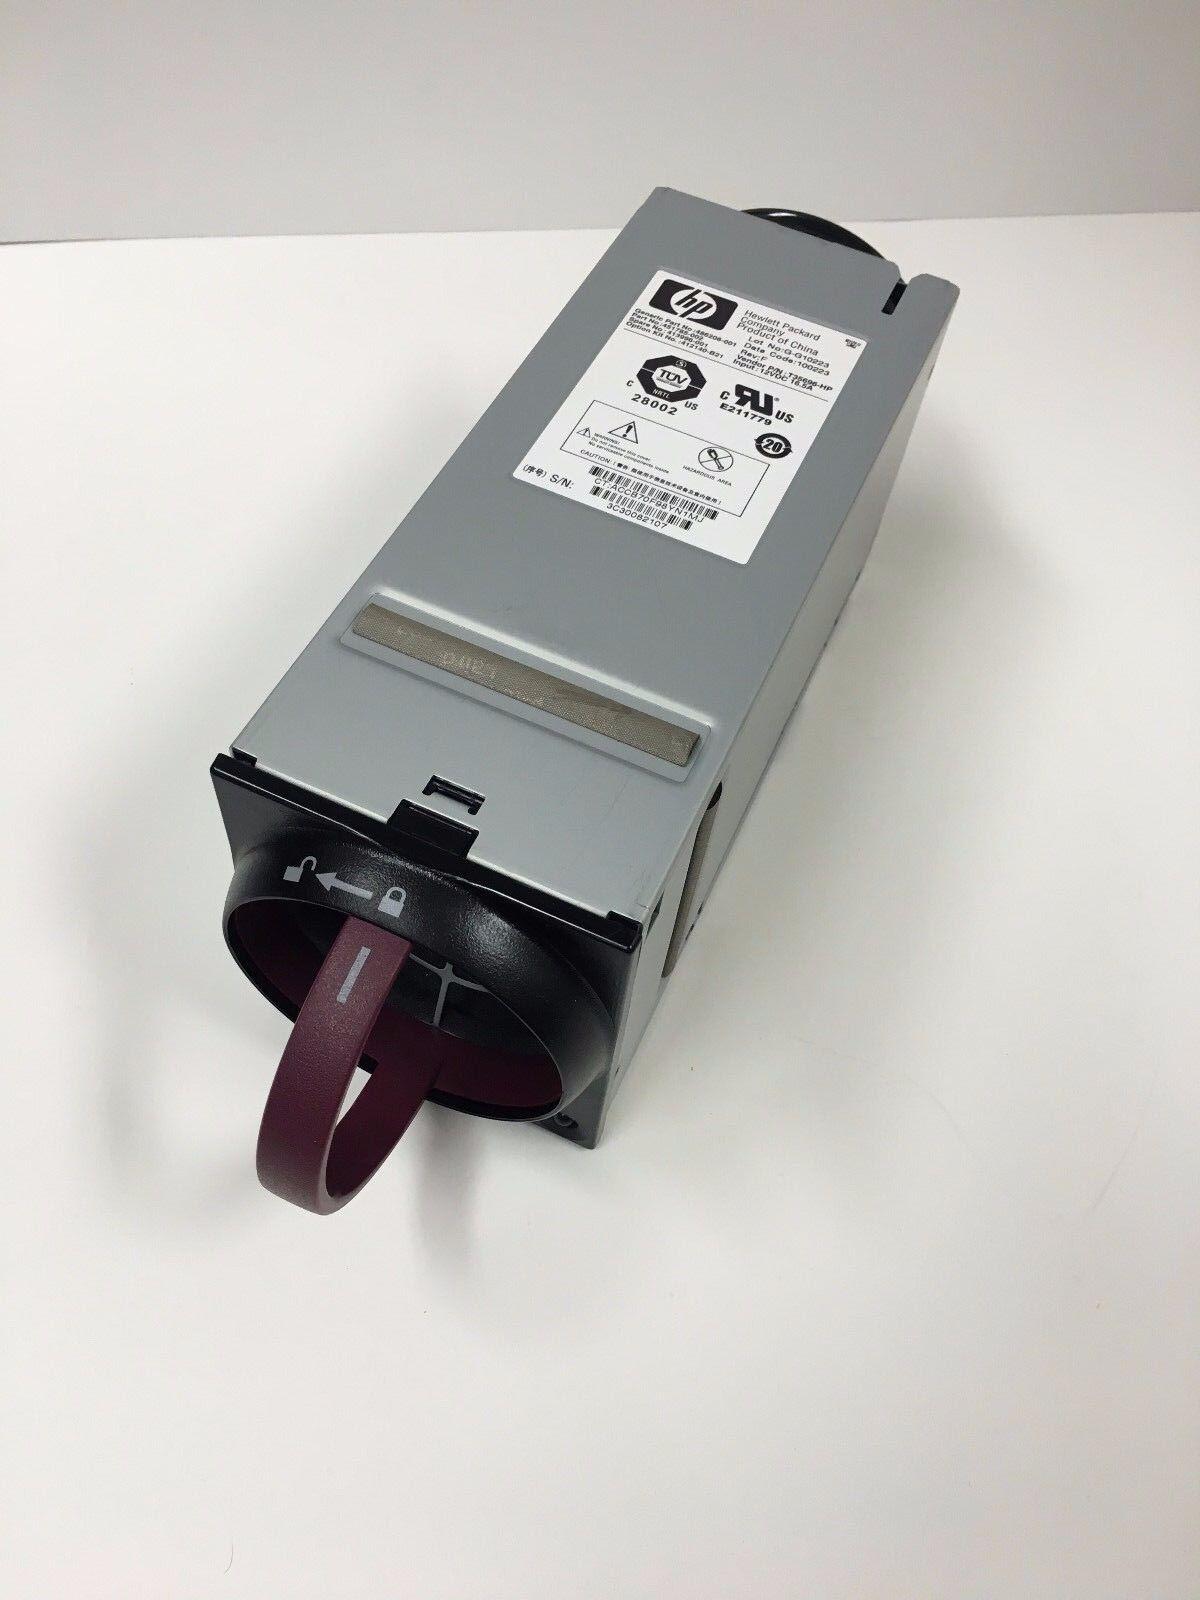 LOT OF 4 HP 412140-B21 BLC7000 Enclosure Single Fan Option 413996-001 389537-001